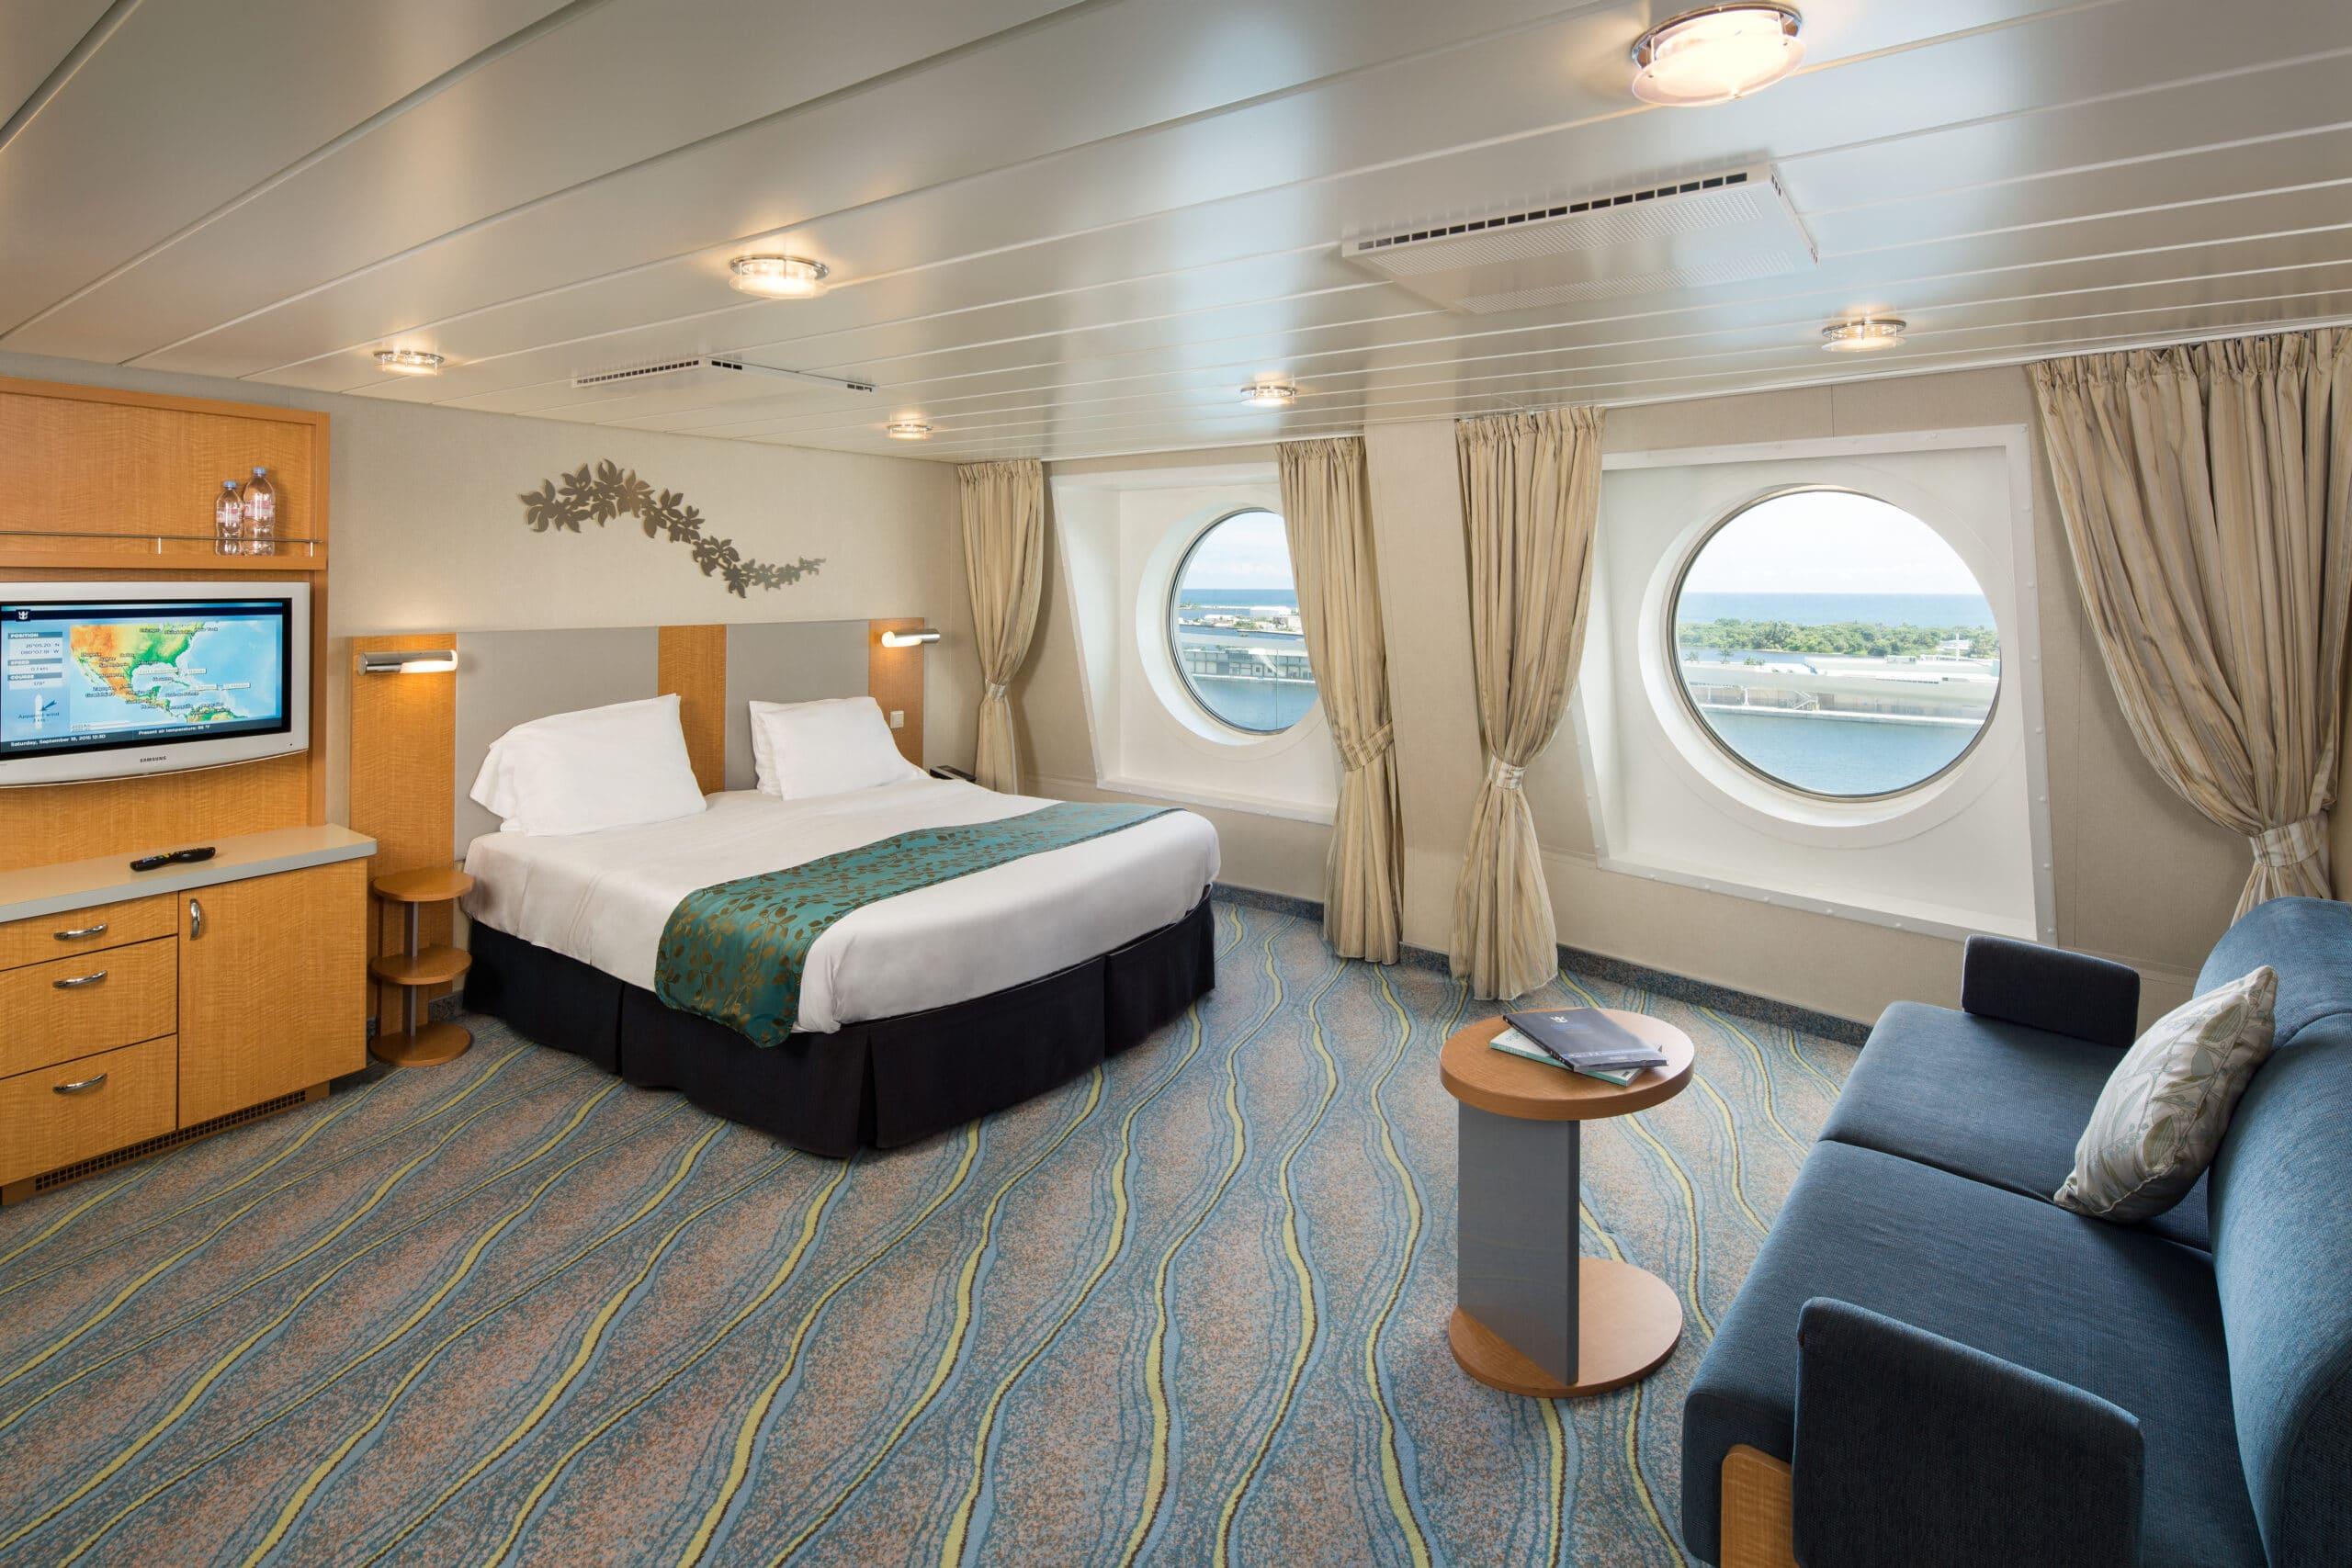 Royal-Caribbean-International-Allure-of-the-Seas-Oasis-of-the-seas-schip-cruiseschip-categorie-1K-Ultra-ruime-buitenhut